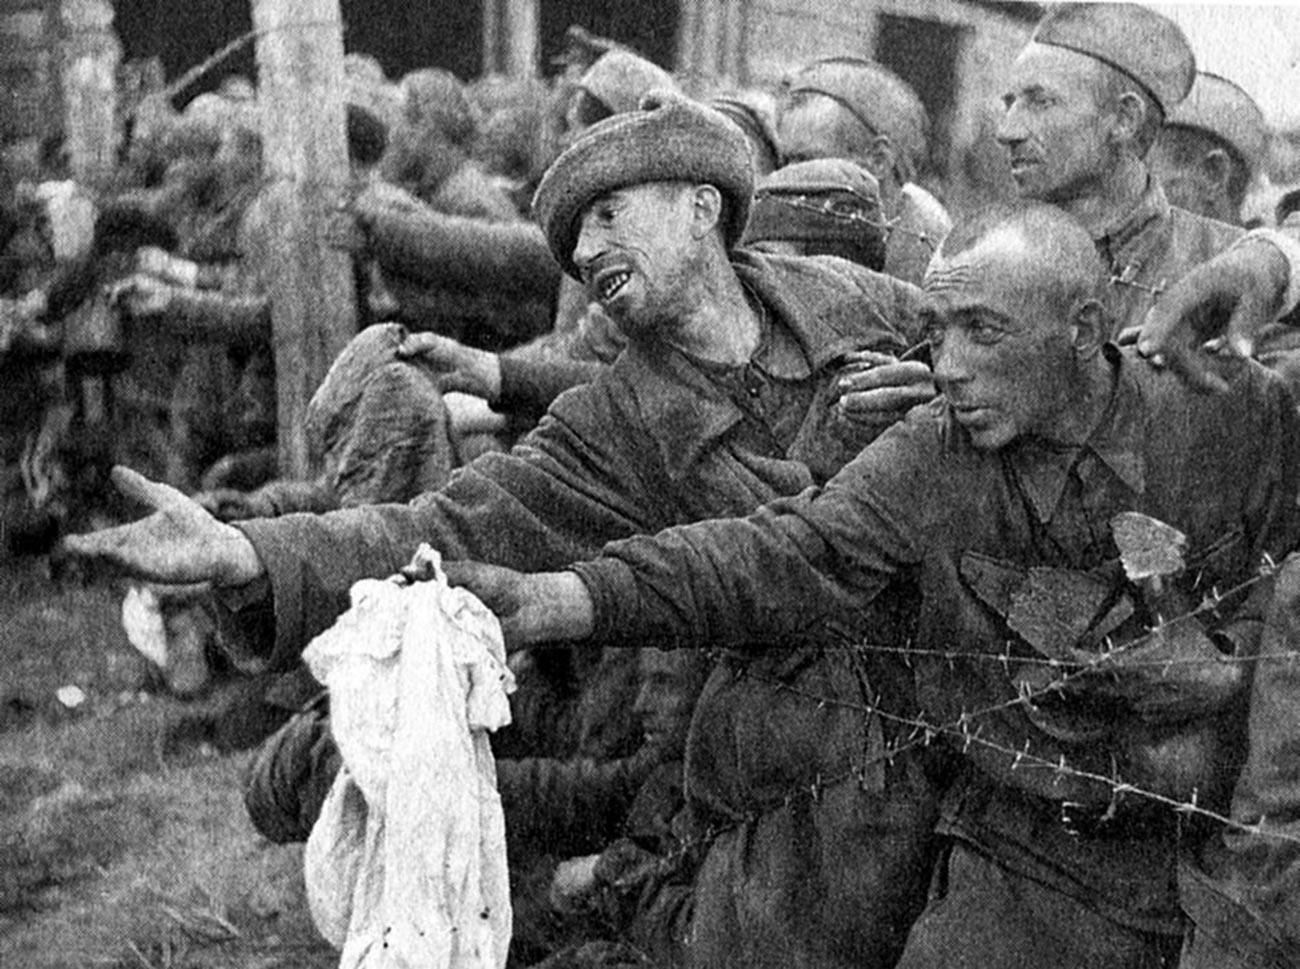 Prigionieri di guerra sovietici